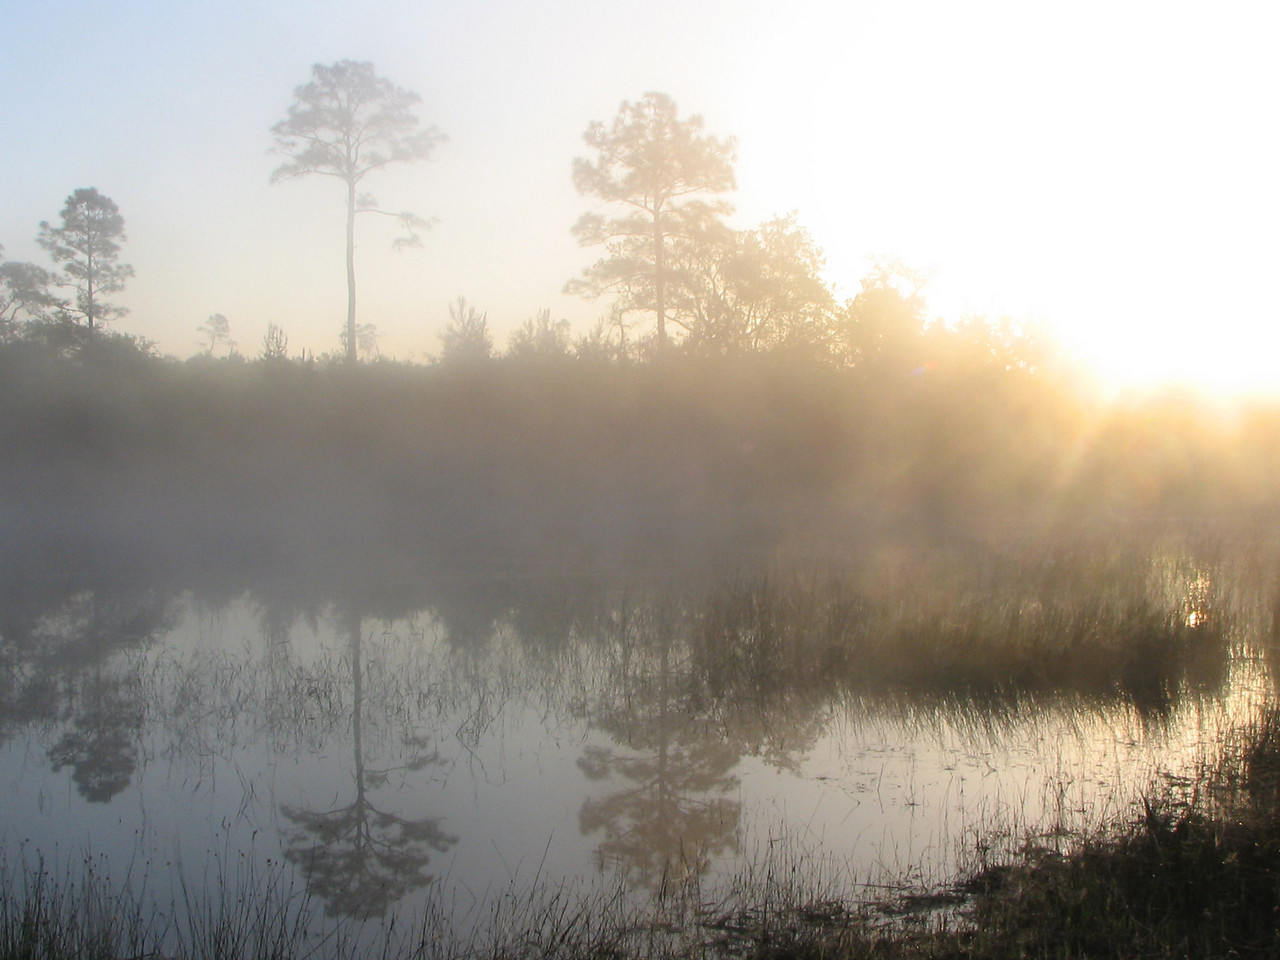 Mist on pond at dawn<br /> Photo credit: Janette Davison / Florida Trail Association